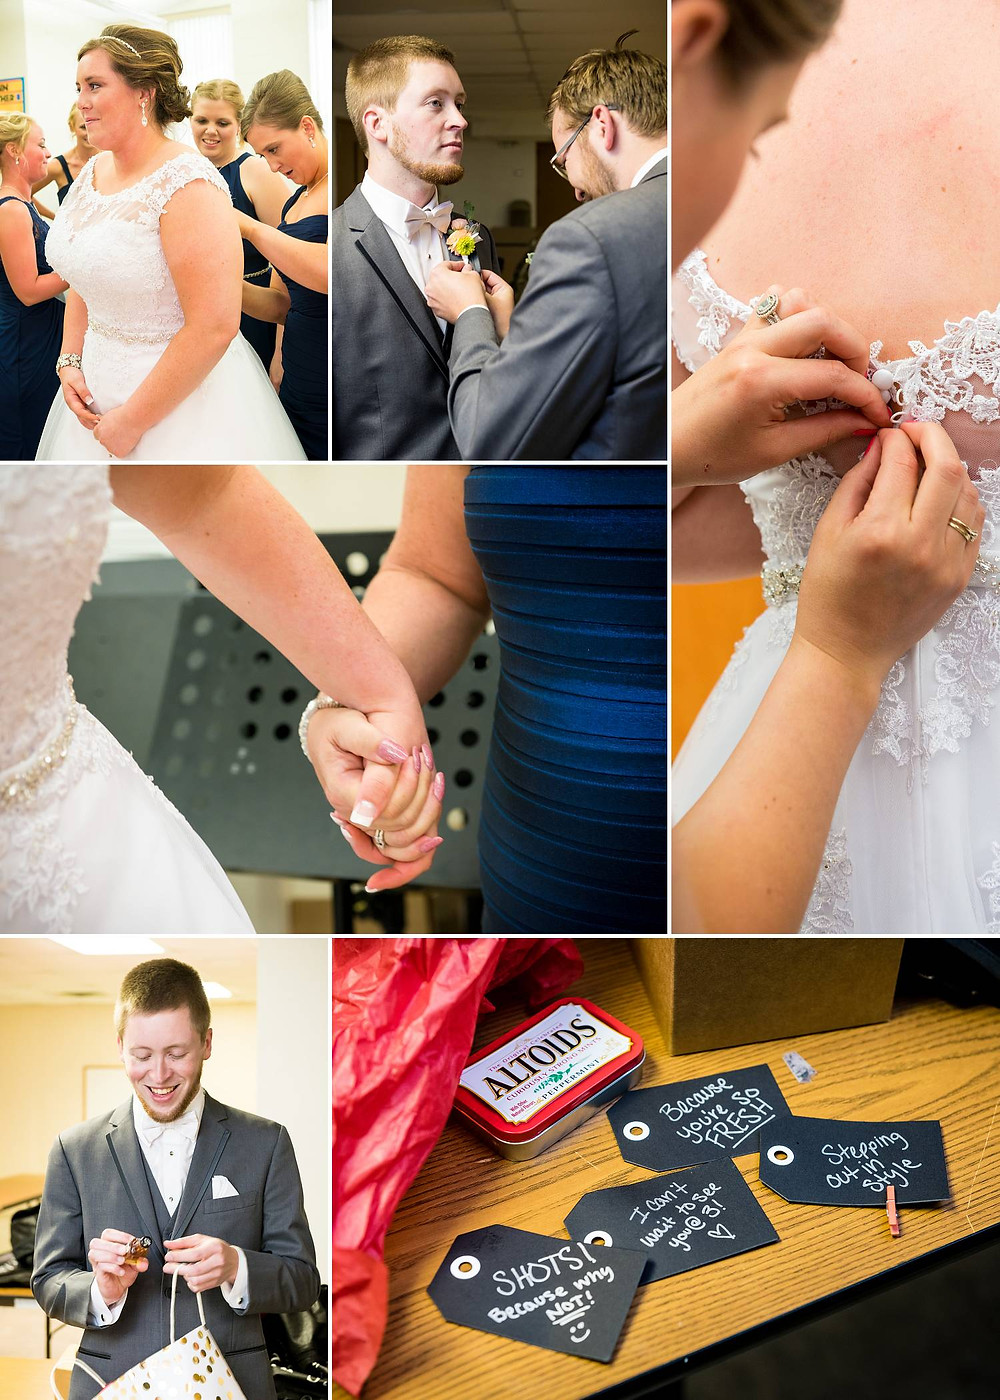 Oshkosh Wisconsin Summer Wedding | Lanari Photography